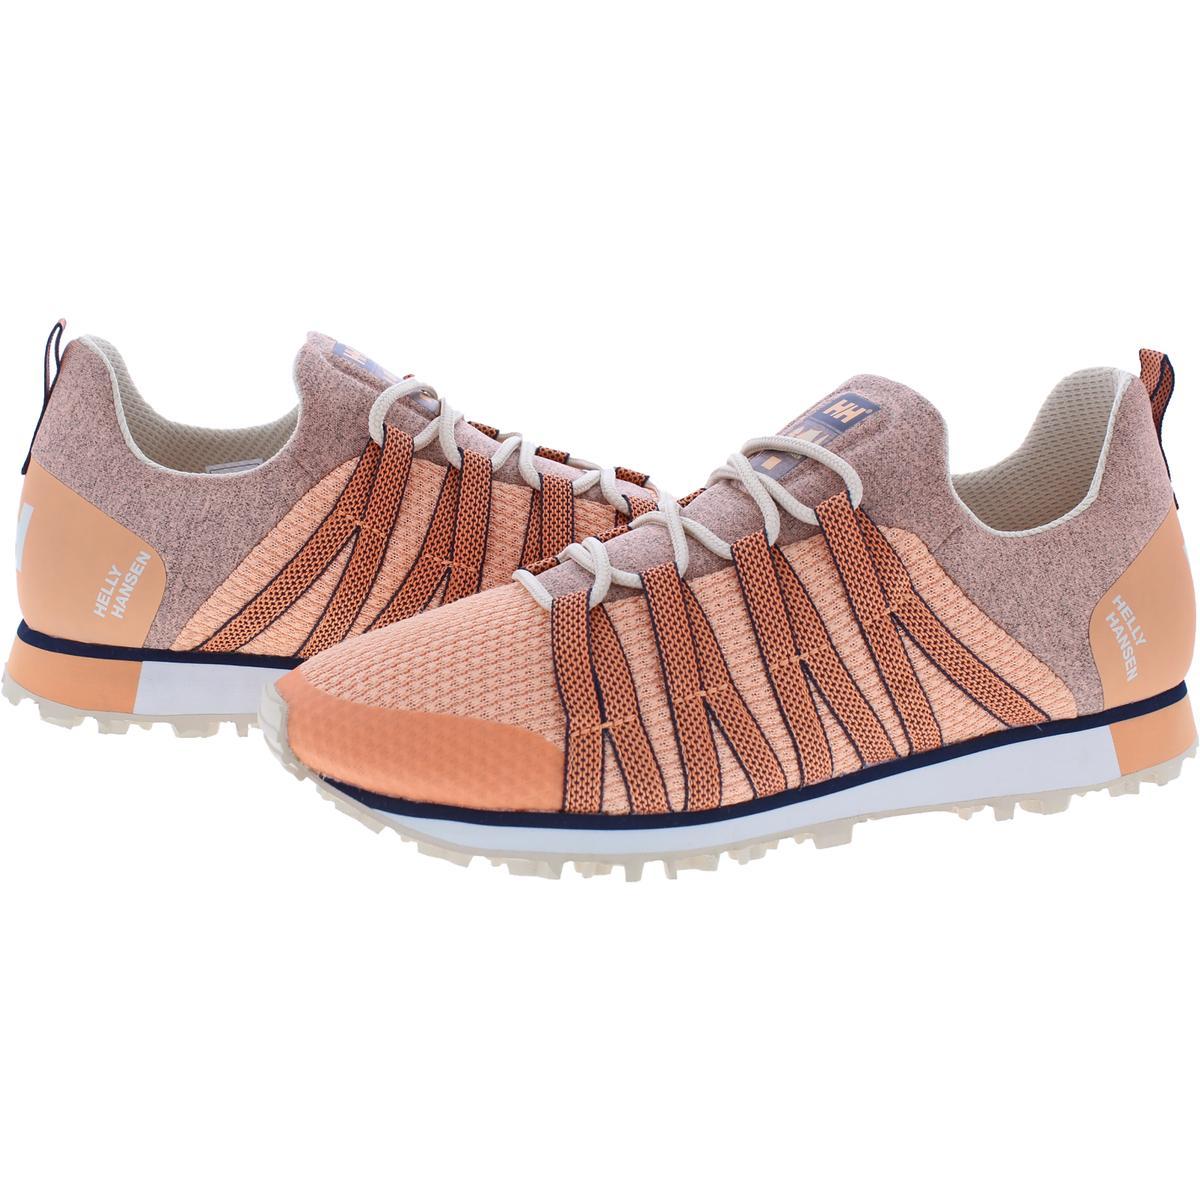 thumbnail 12 - Helly-Hansen-Womens-Vardapeak-V2-Fitness-Performance-Sneakers-Shoes-BHFO-9846